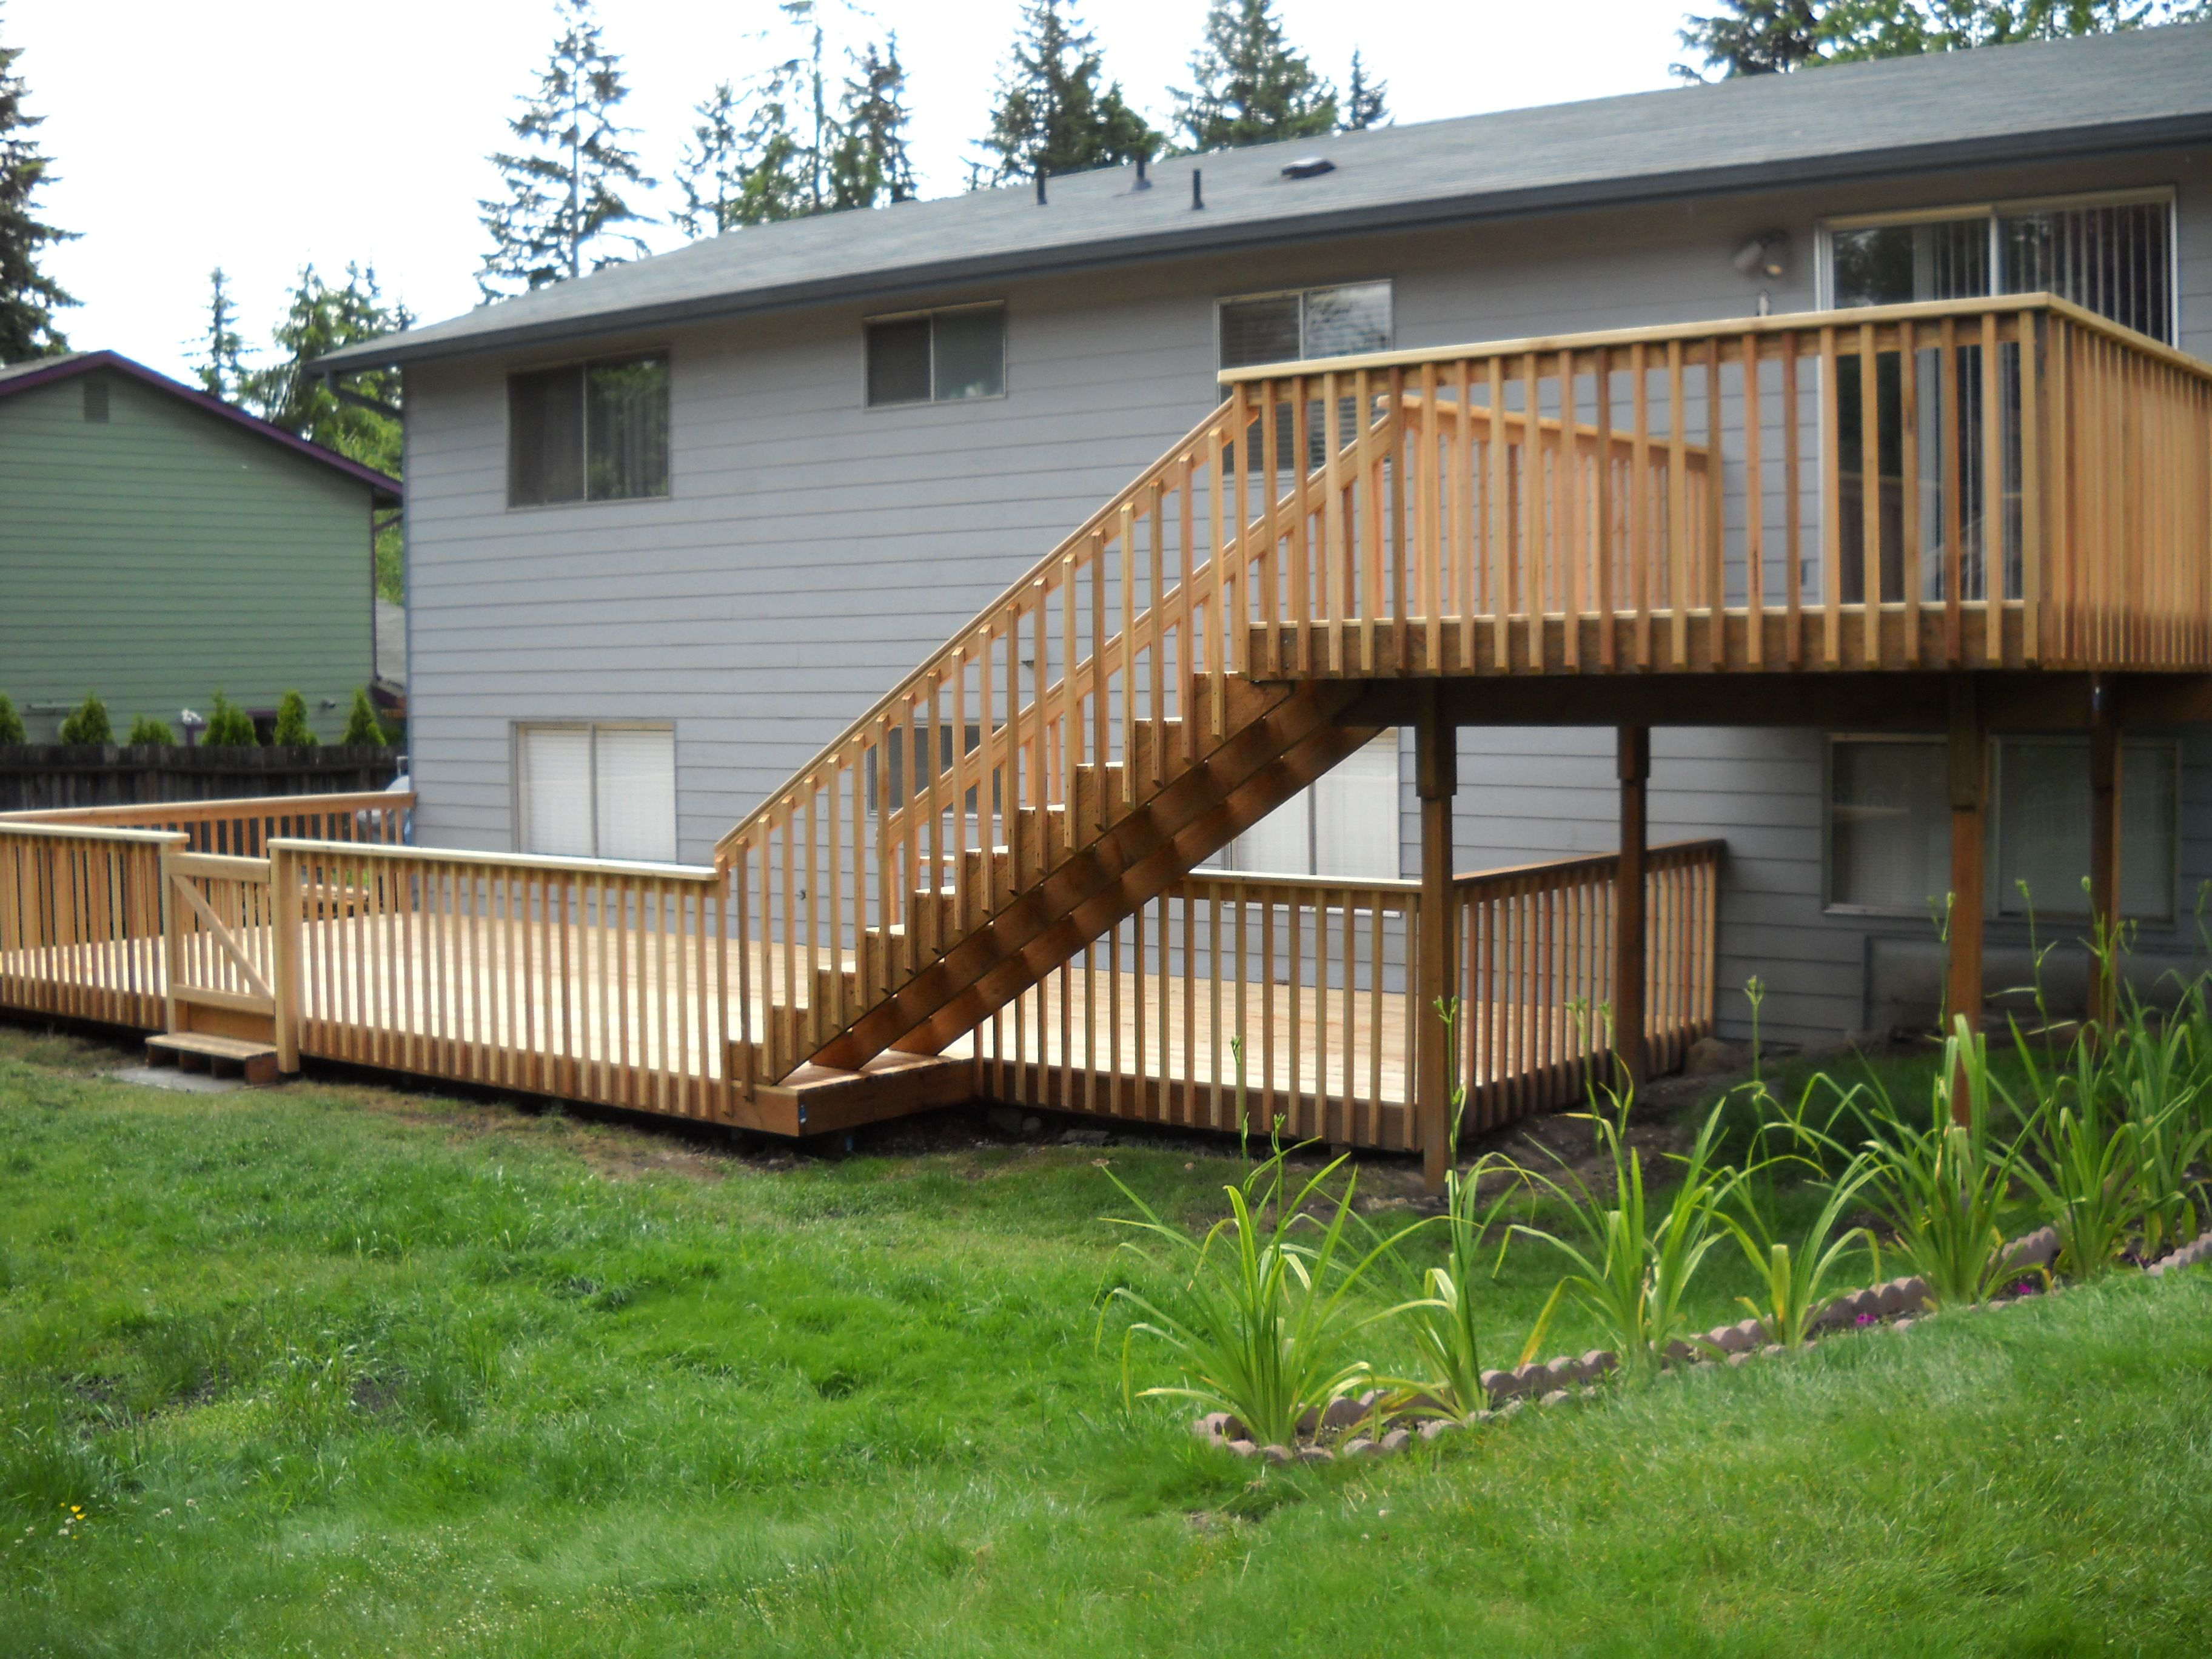 The Complete Guide About Multi Level Decks With 27 Design Ideas Building A Deck Backyard Deck Decks Backyard